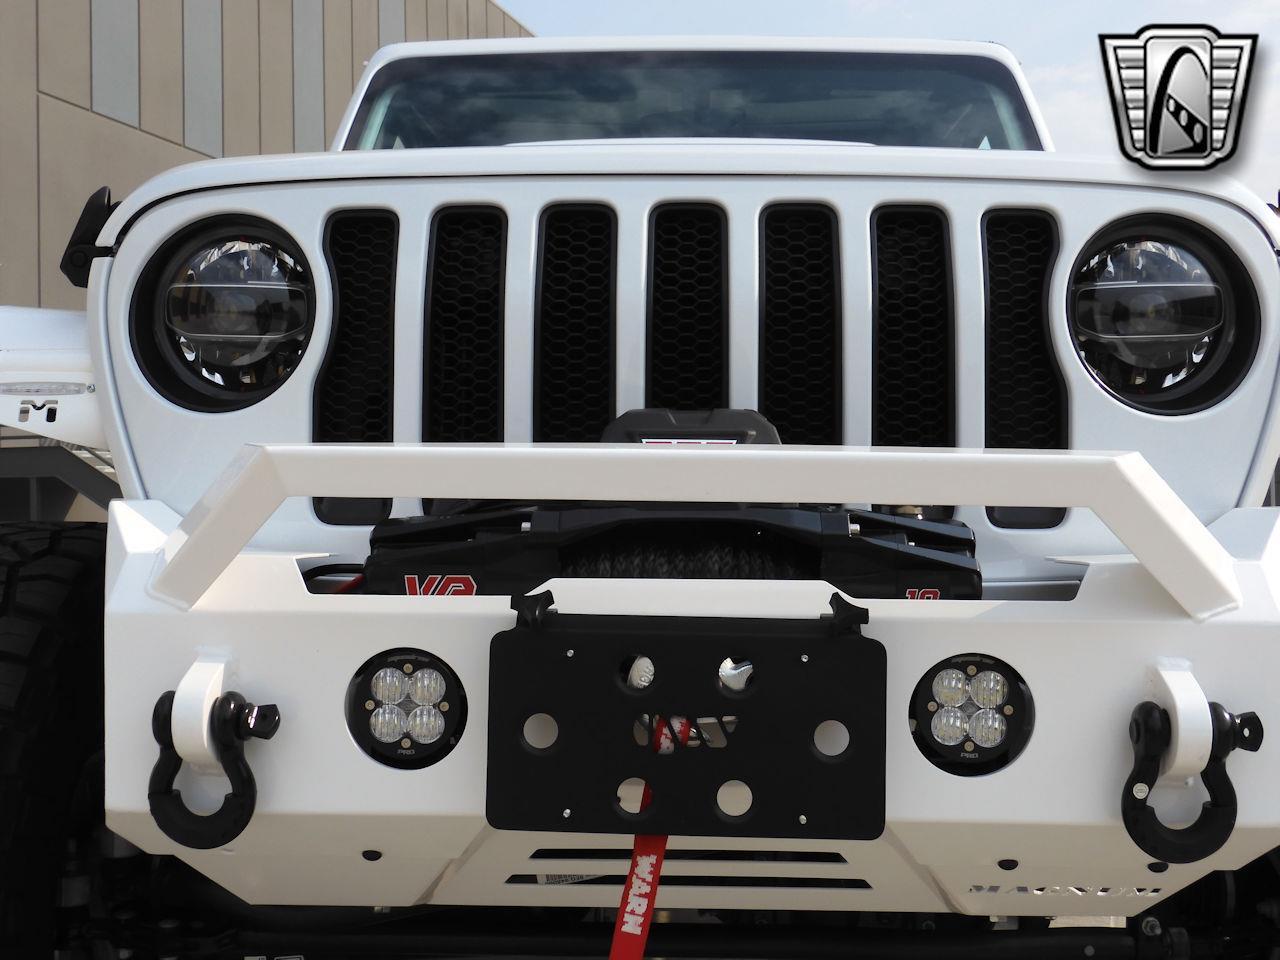 2019 Jeep Wrangler (CC-1391657) for sale in O'Fallon, Illinois